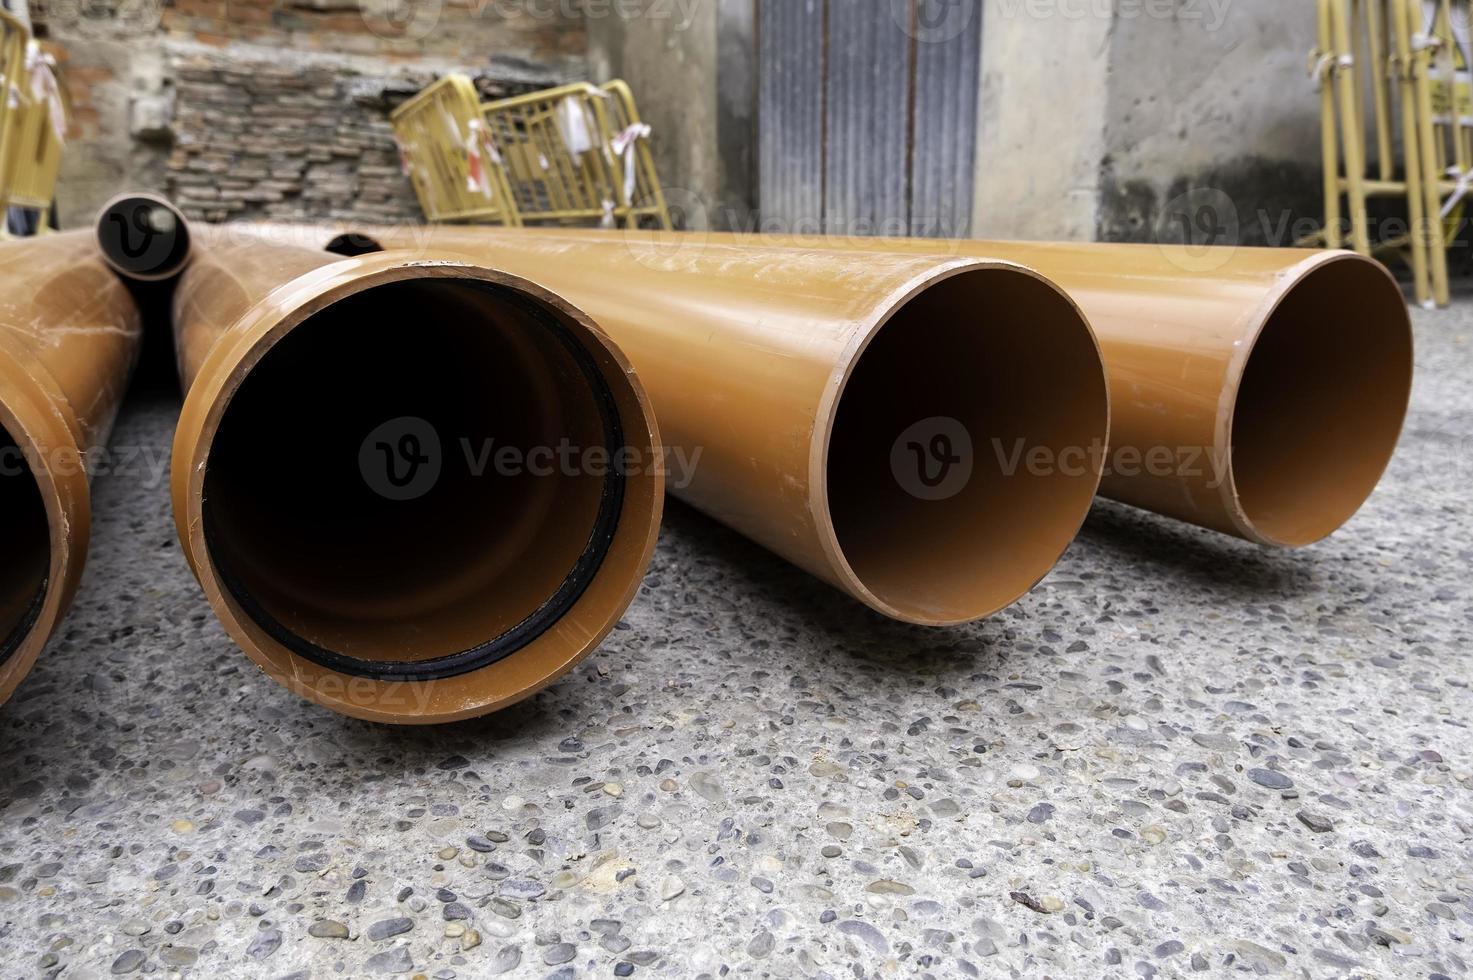 tubos de mampostería marrón foto